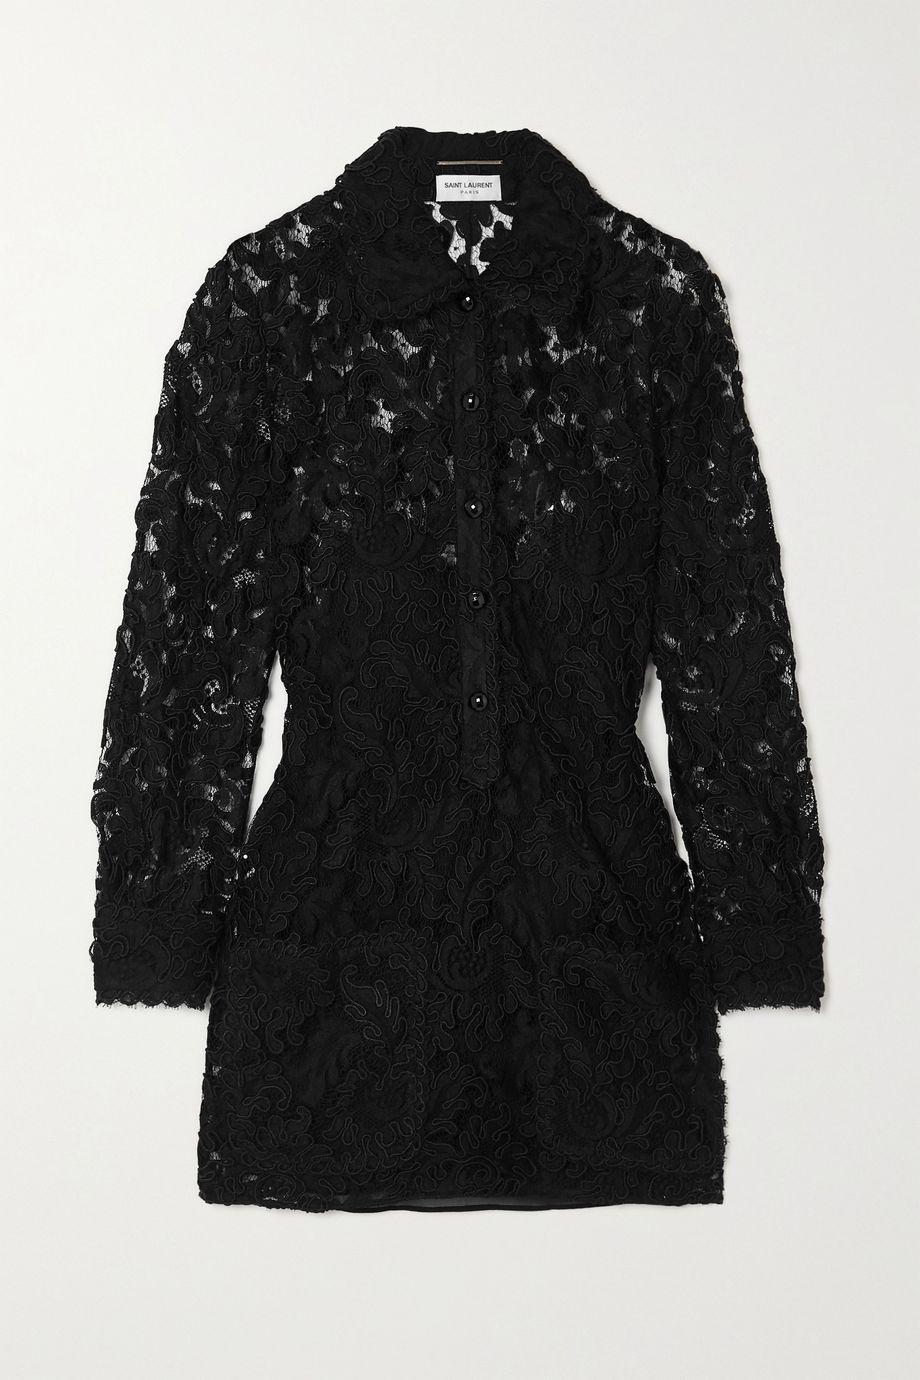 SAINT LAURENT Corded lace mini shirt dress